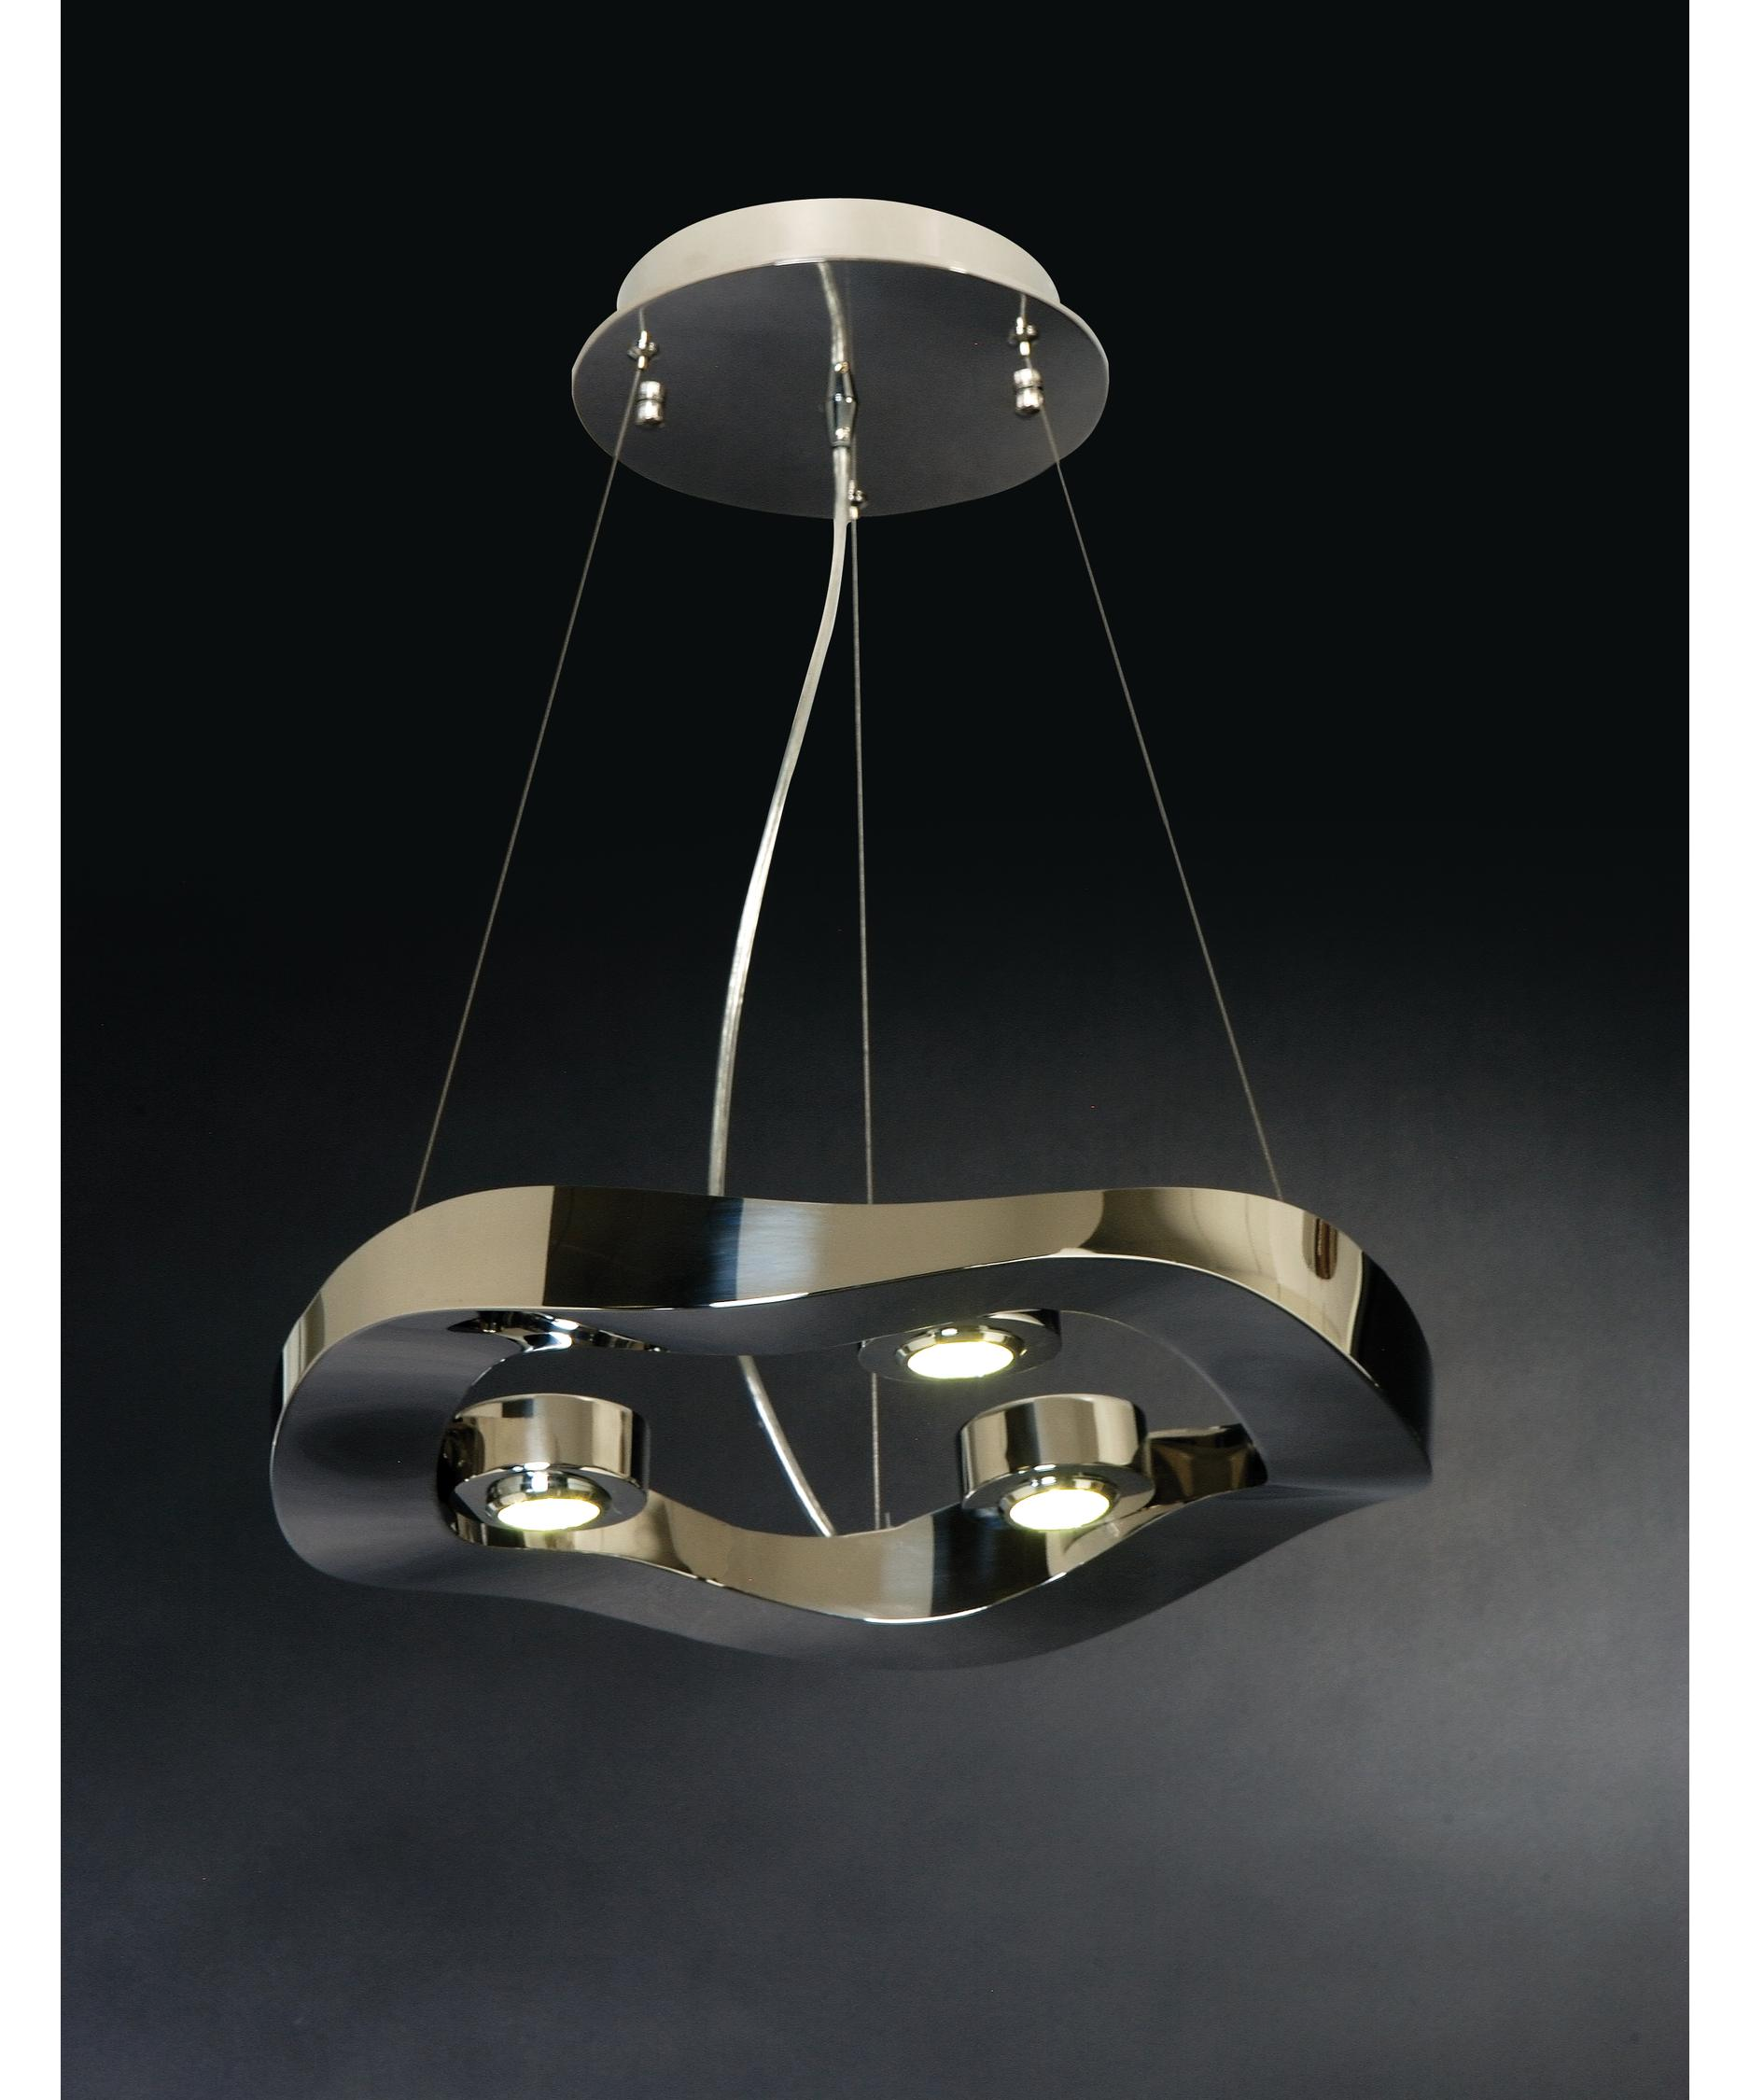 trend lighting tp halo  inch wide  light mini pendant  - trend lighting tp halo  inch wide  light mini pendant  capitollighting lightingcom